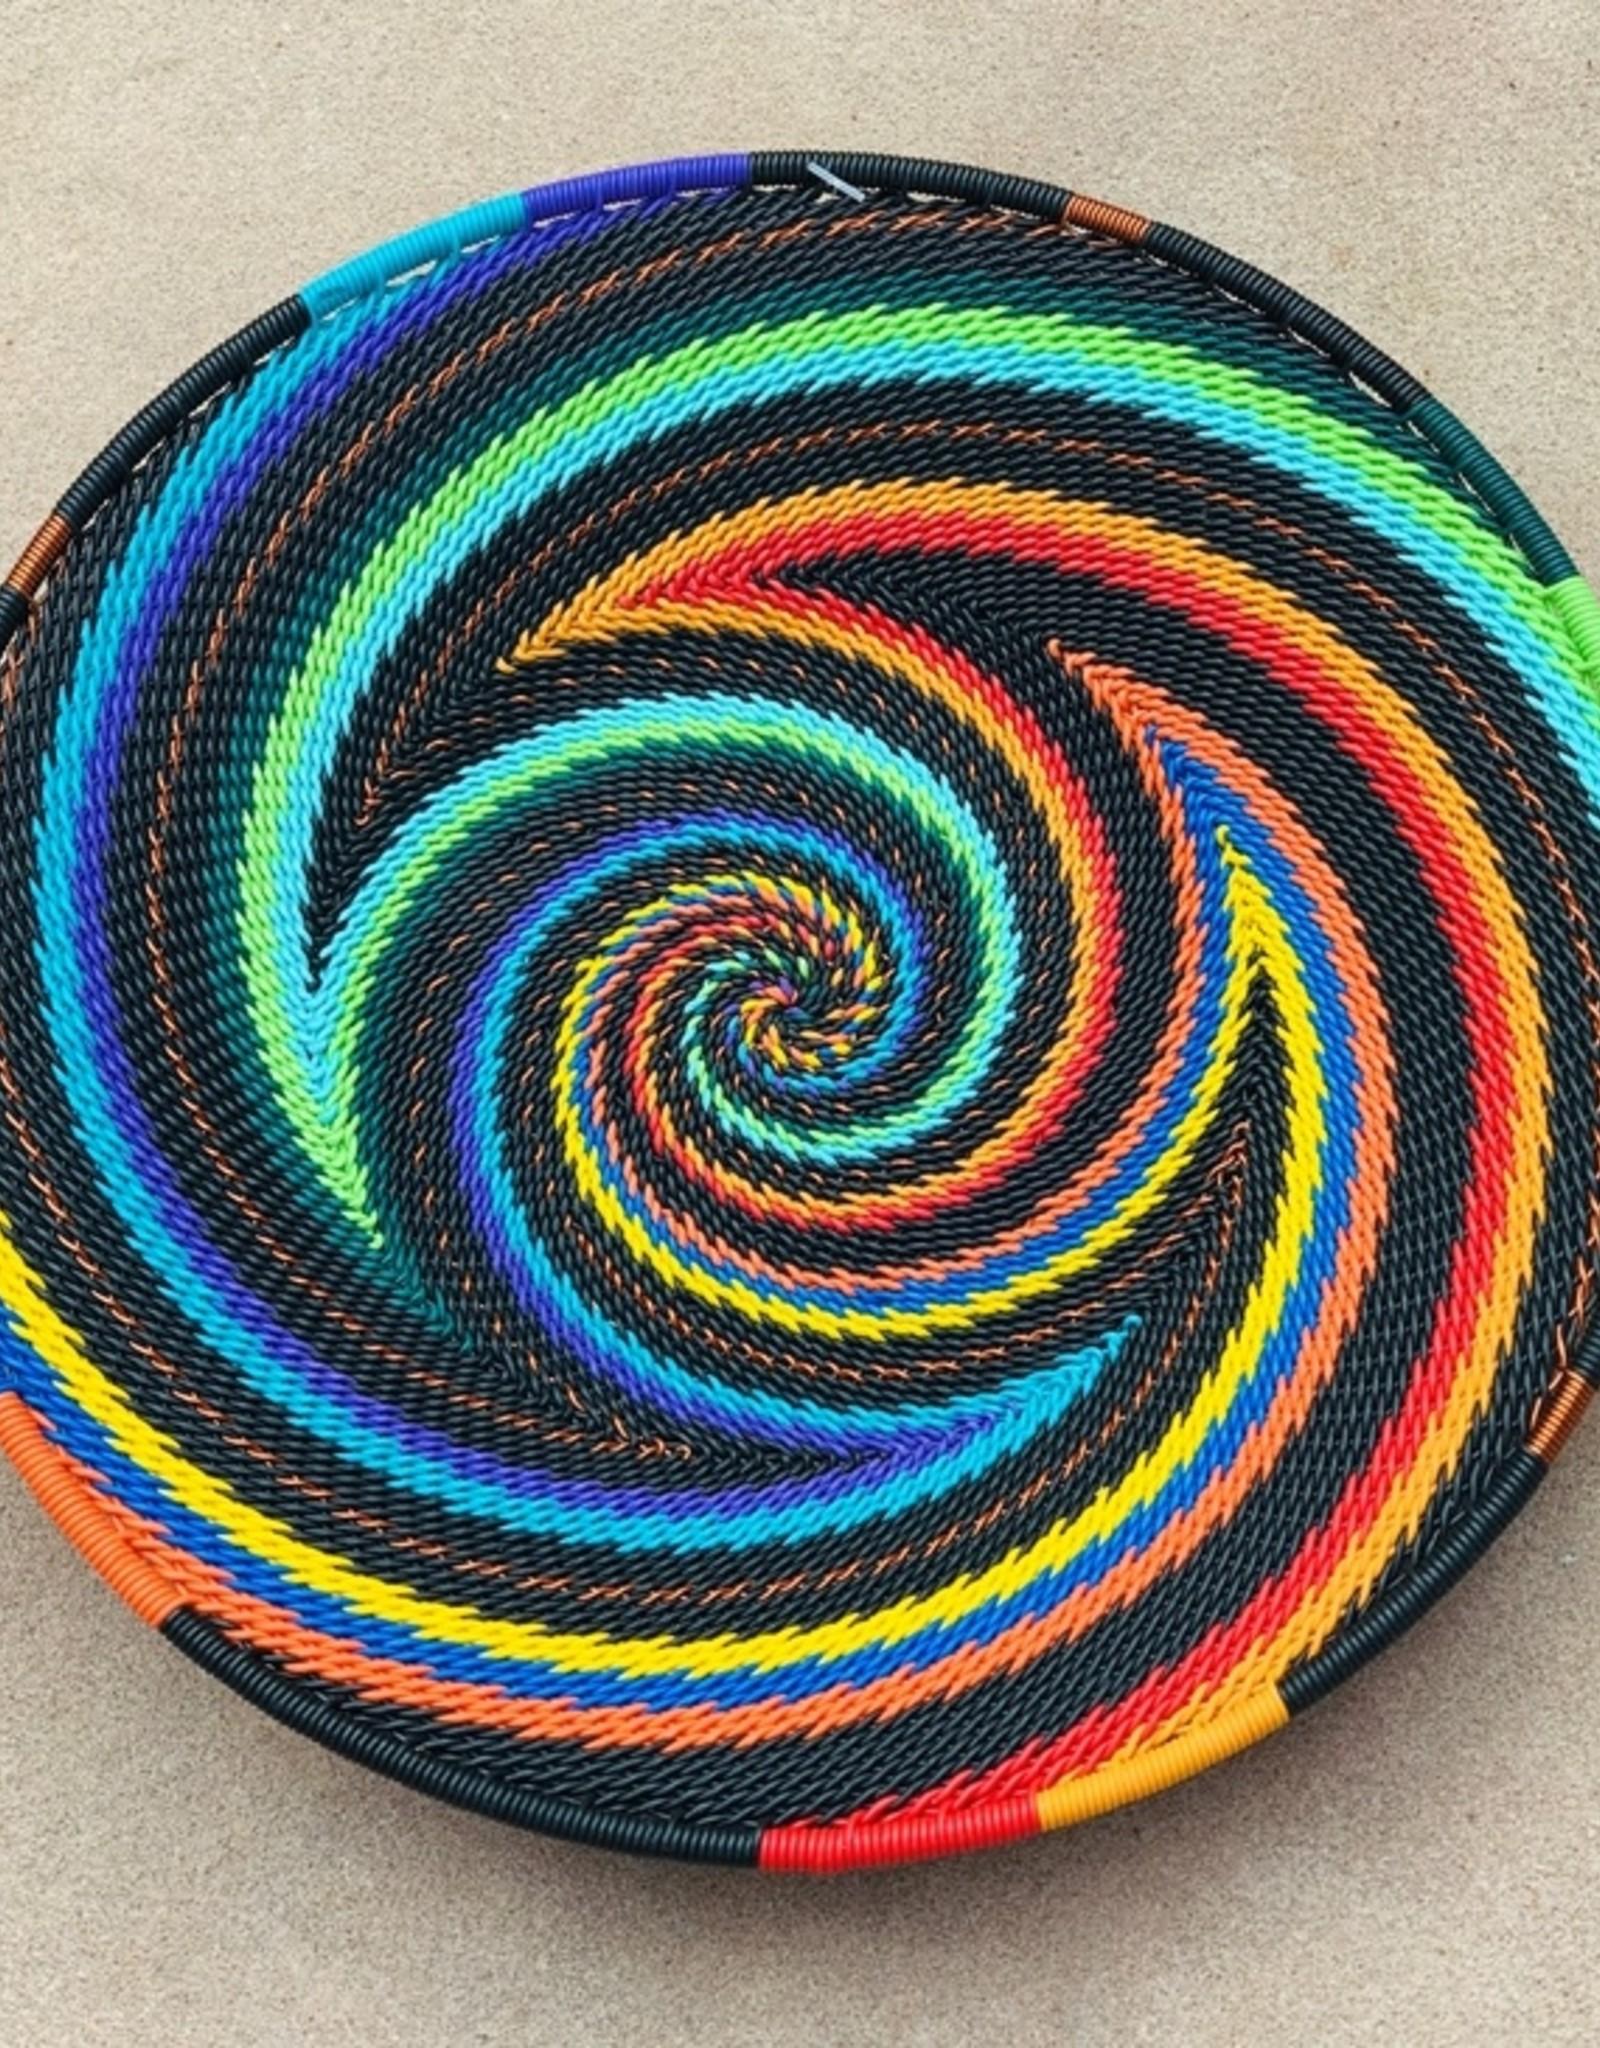 bridge for africa Mini Platter-African Rainbow